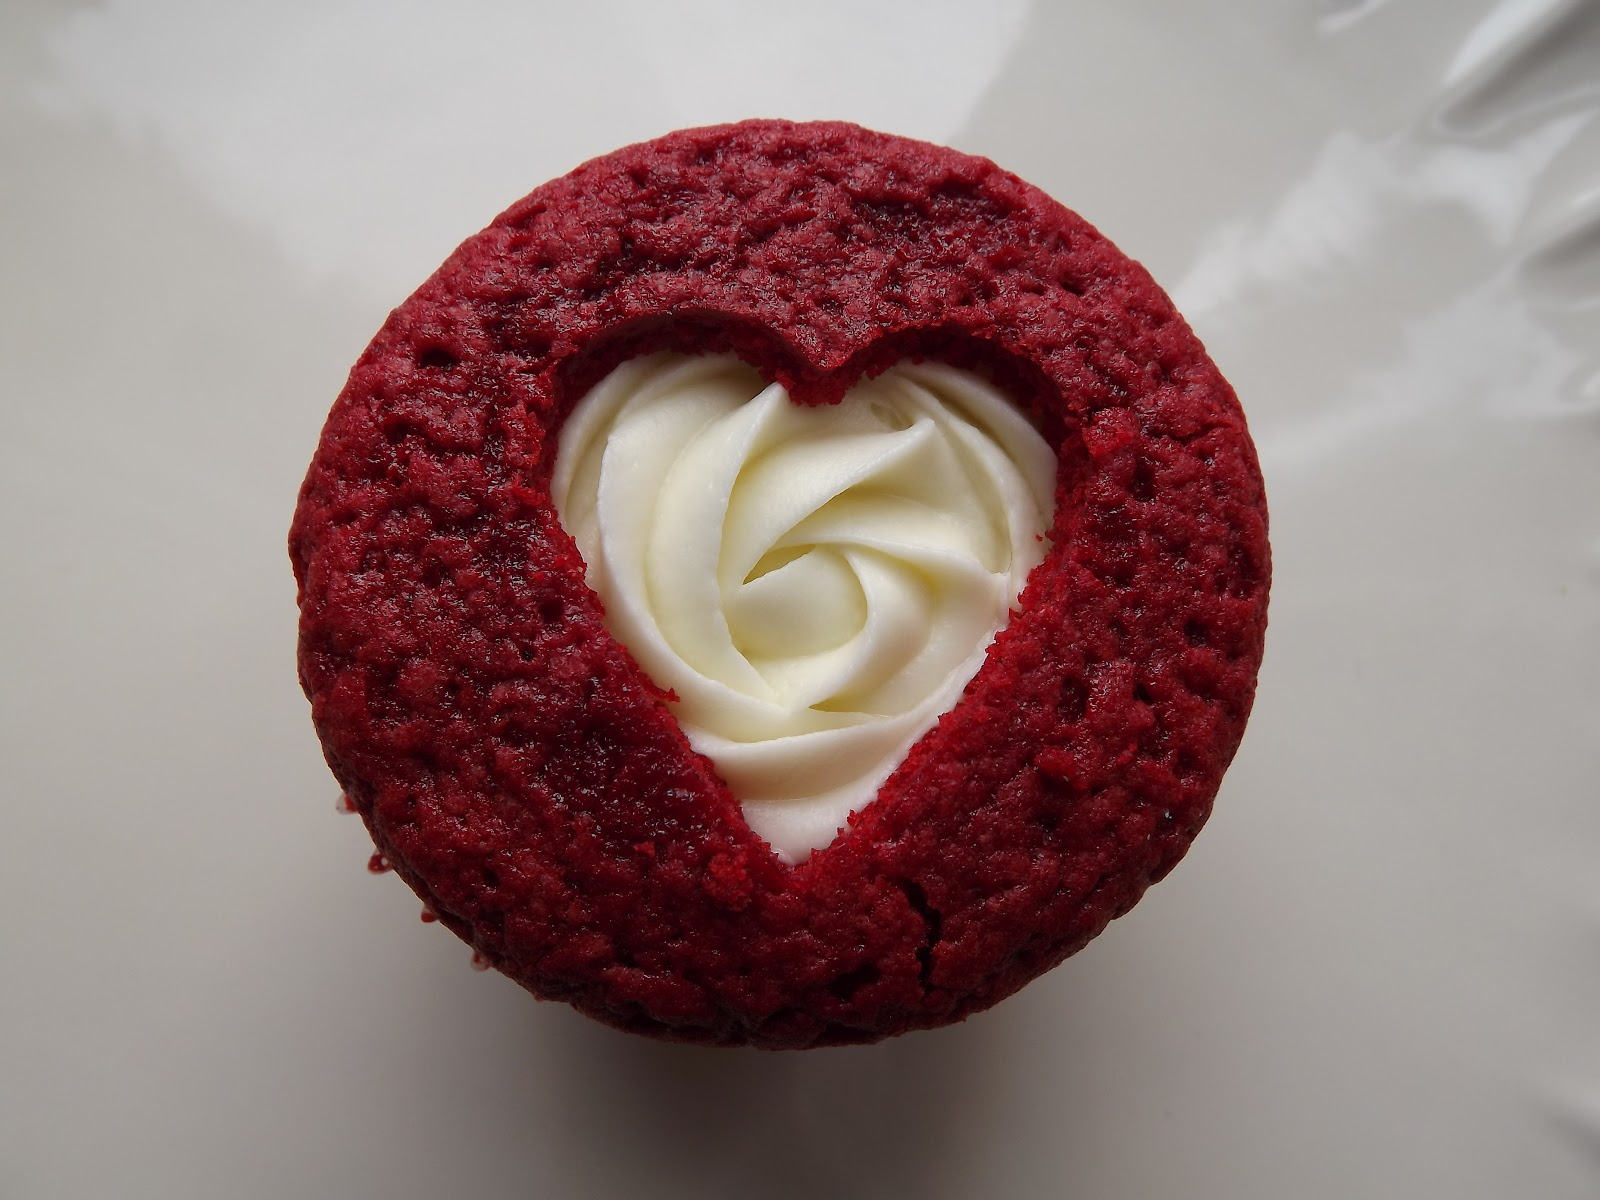 Red Velvet Cake Recipe Kenya: GIFs: Valentine Wishes, We Cake You [LOOK]